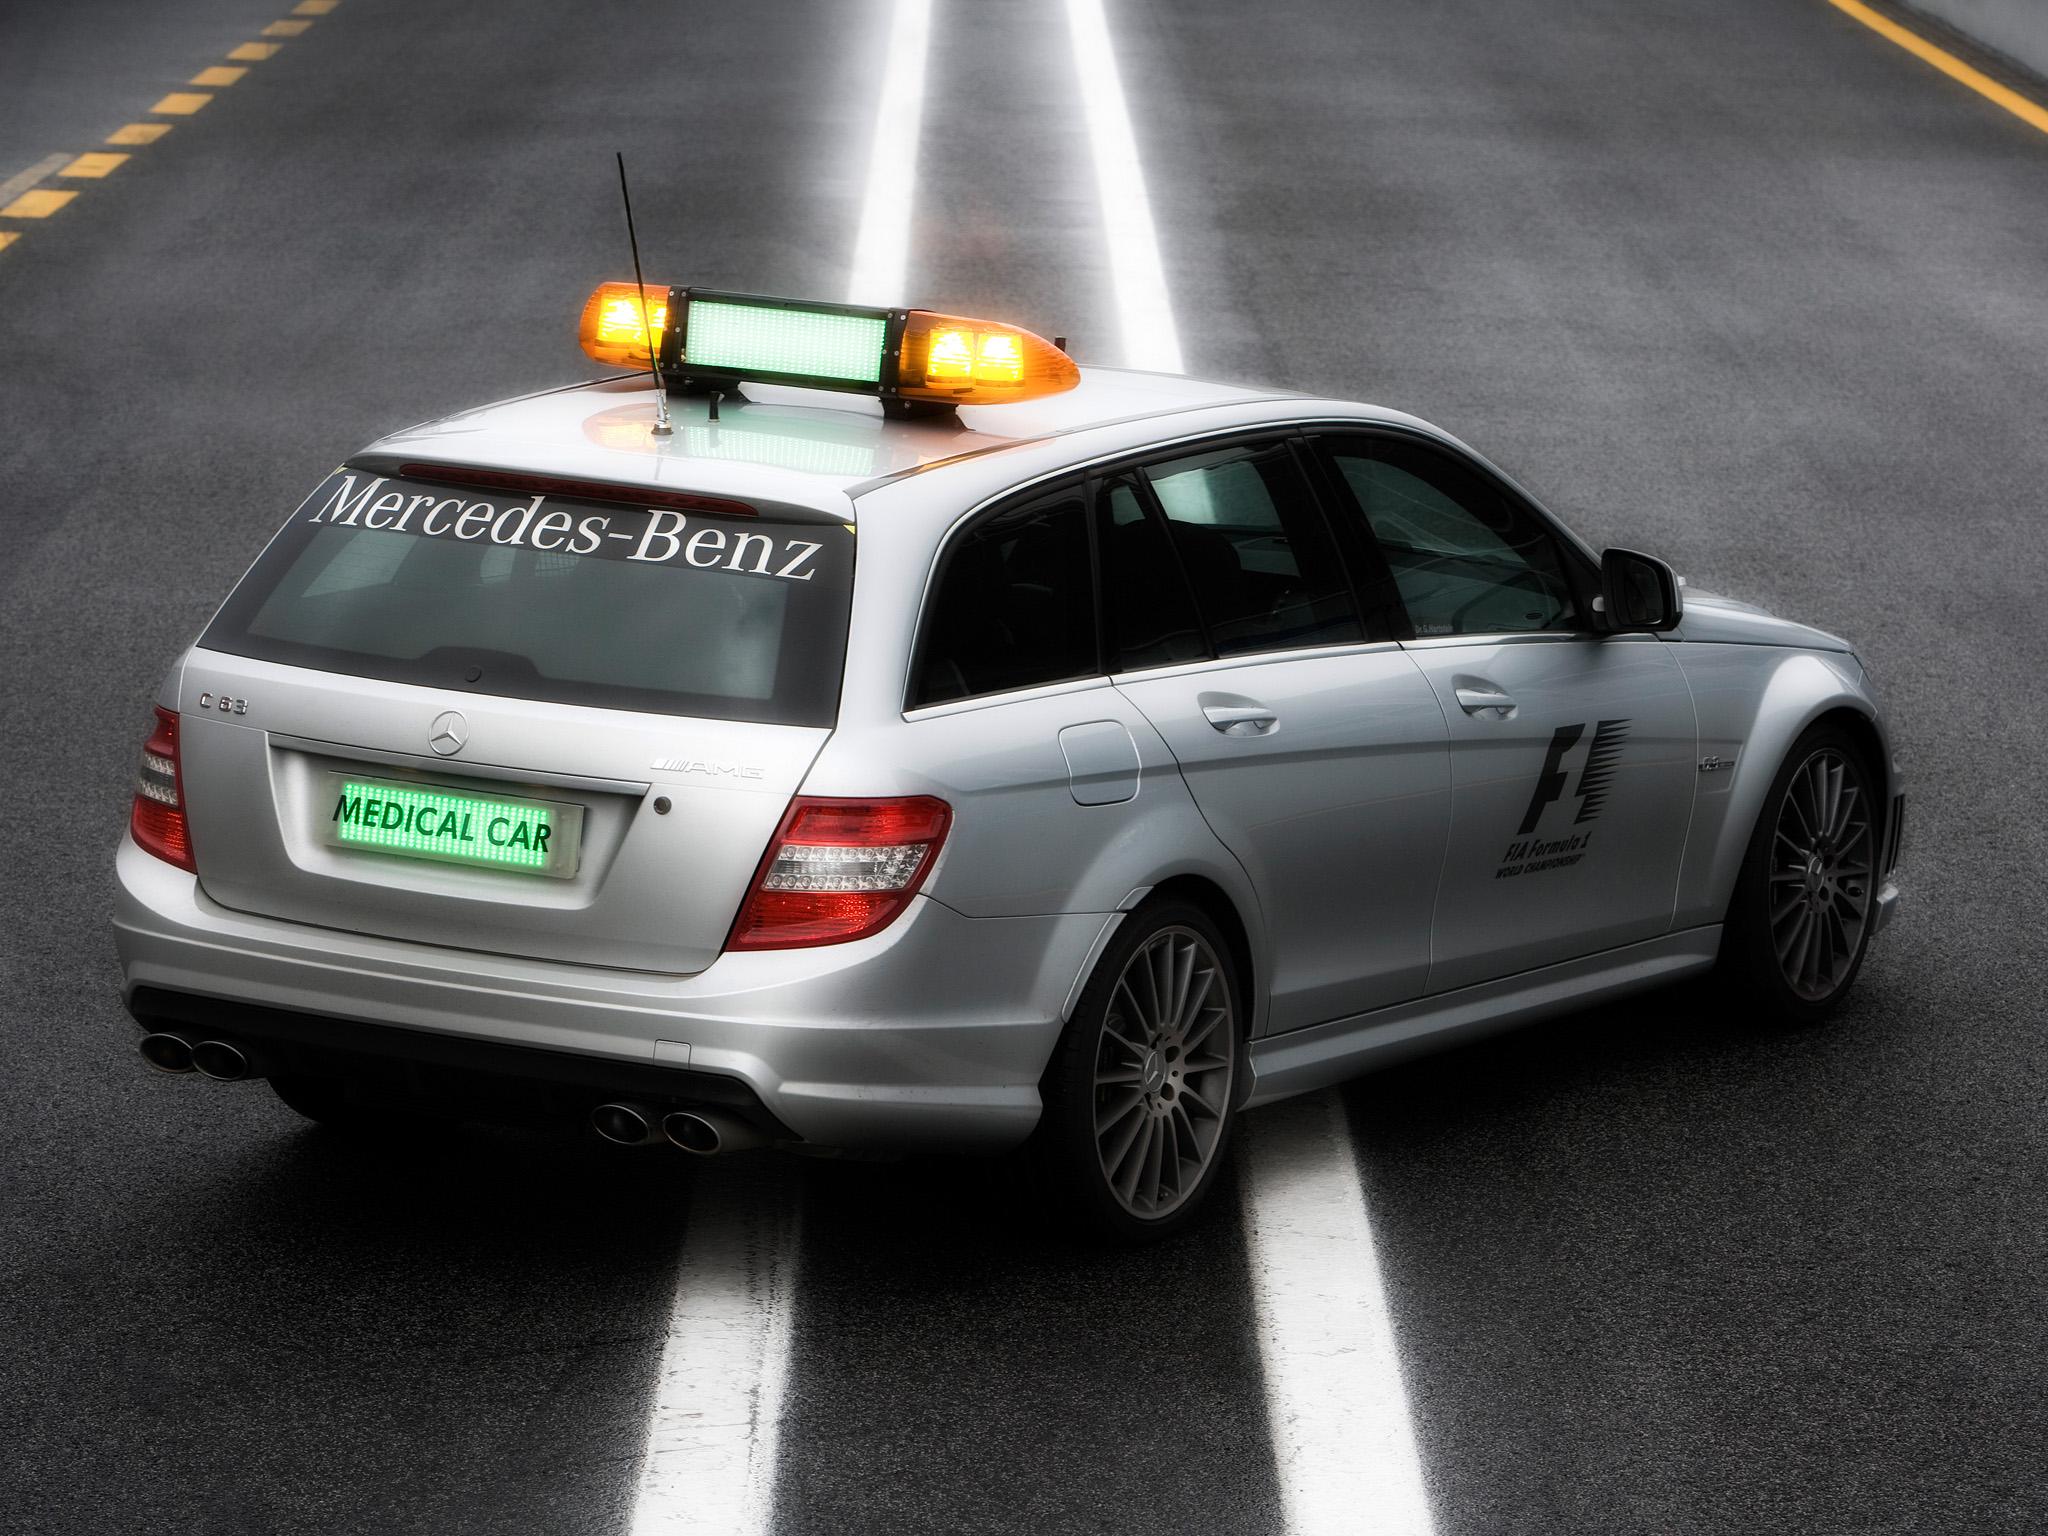 2008 Mercedes Benz C63 Amg Estate F 1 Medical Car S204 Race Racing Formula One Stationwagon Emergency G Wallpaper 2048x1536 151486 Wallpaperup